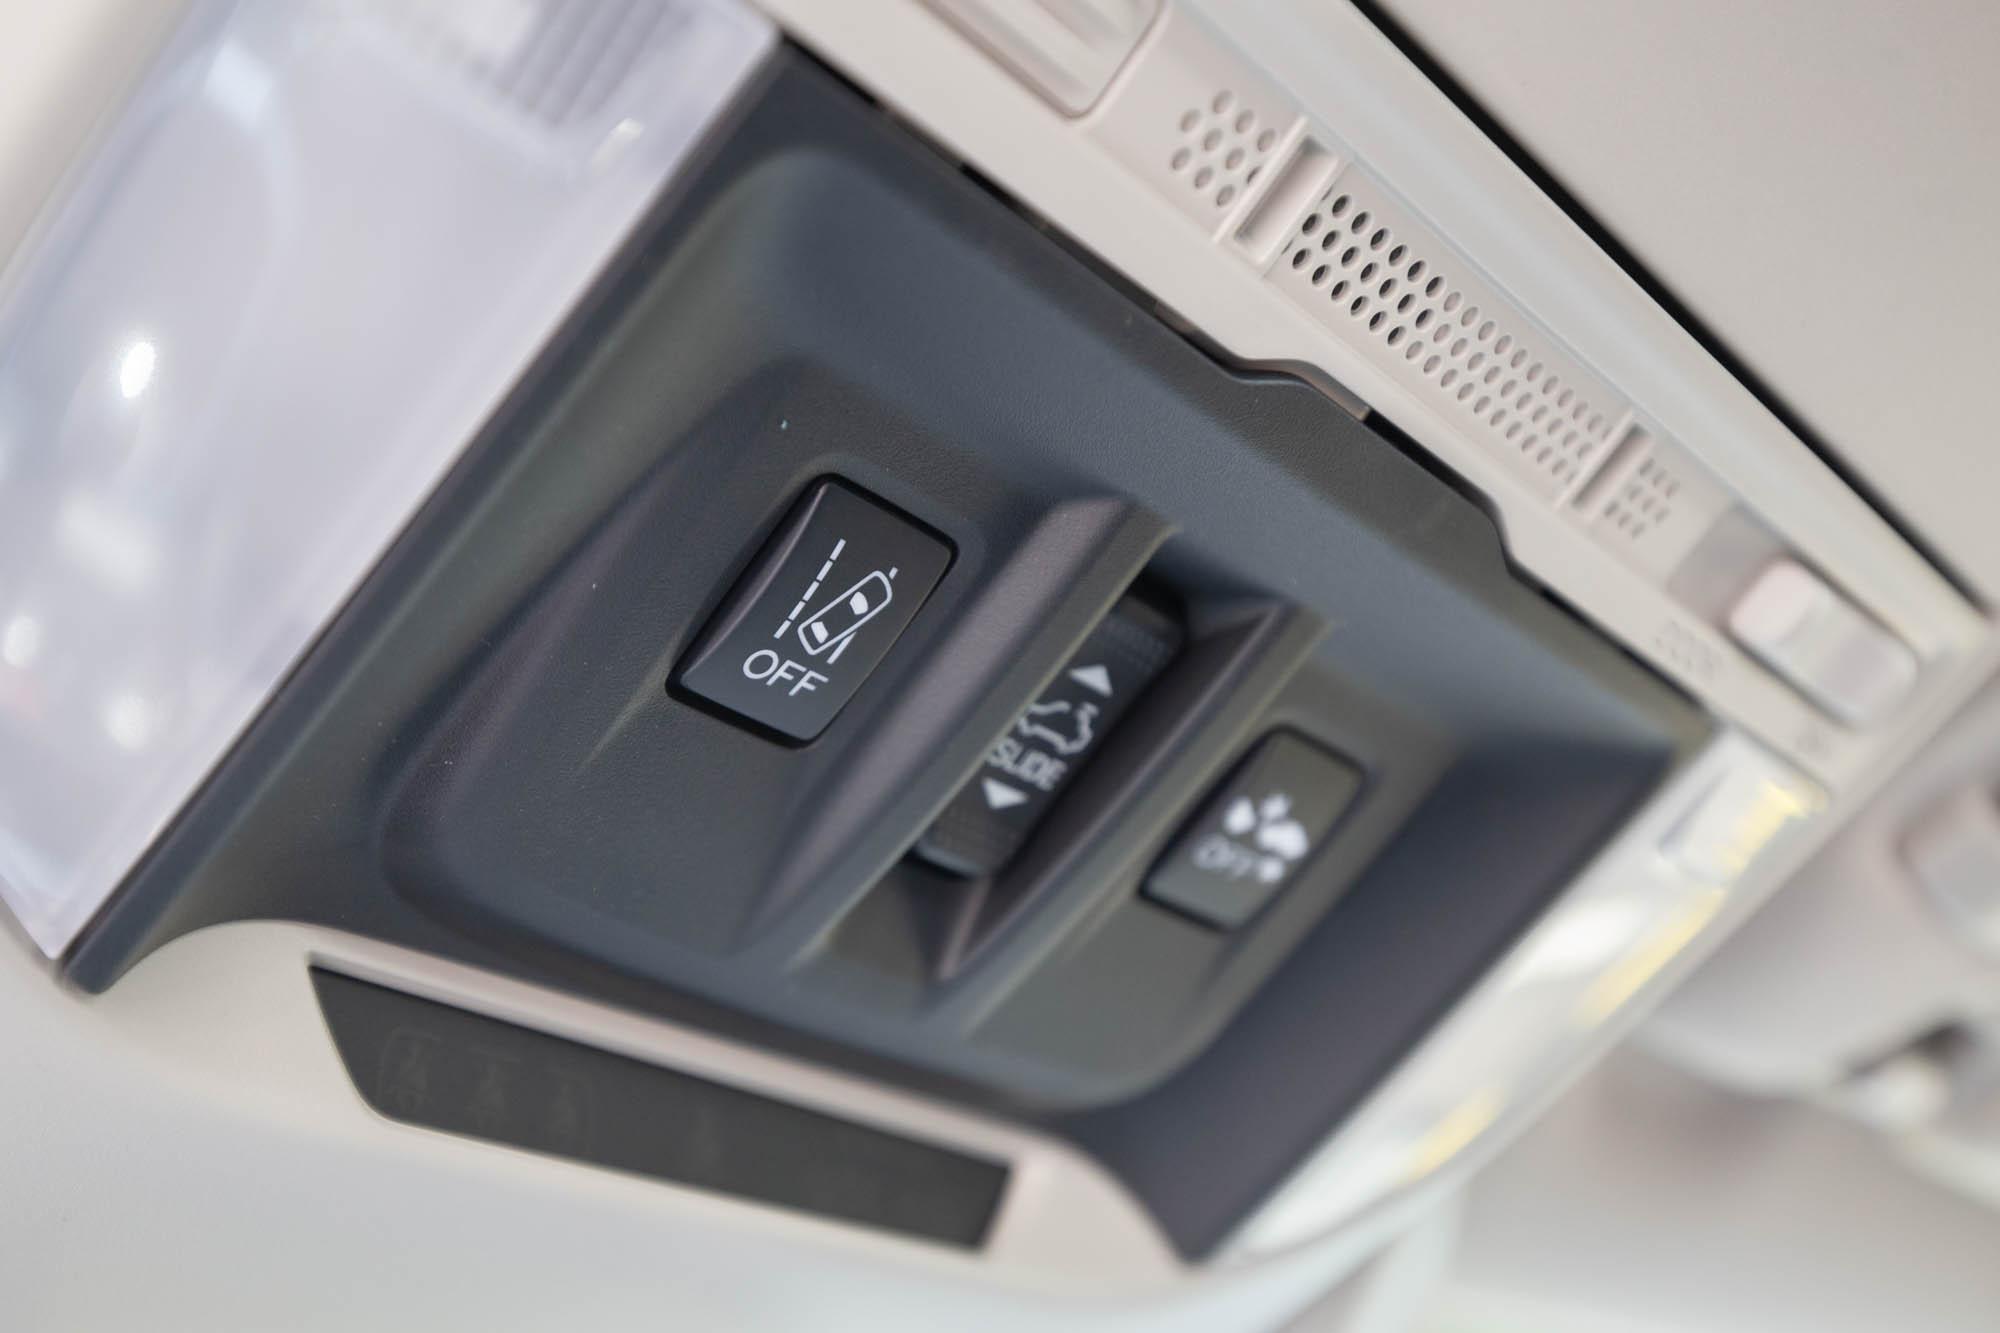 LDW 車道偏擺警示系統警示功能開關設置於車頂。